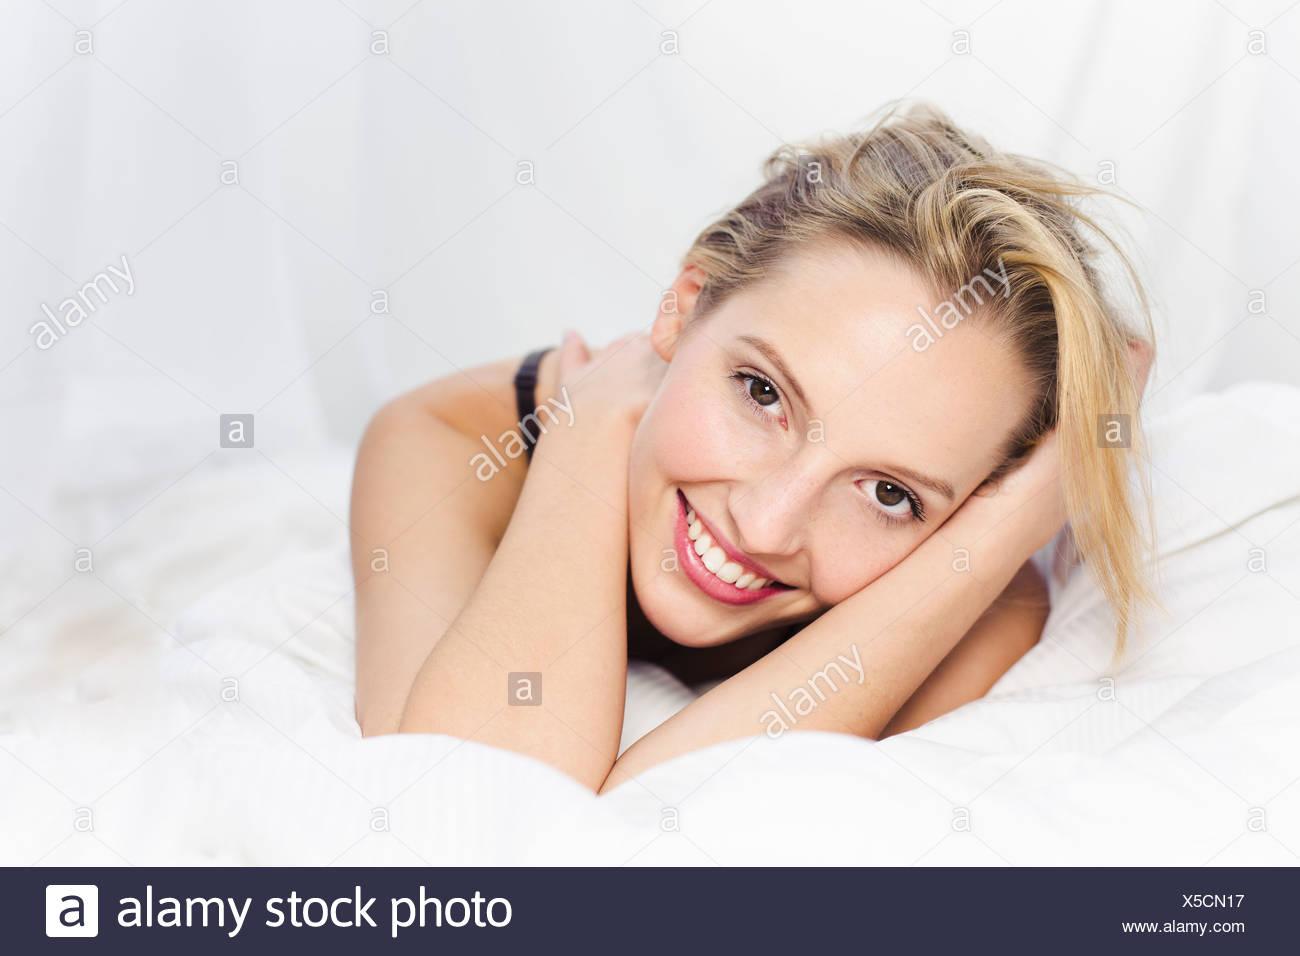 Young woman looking at camera, smiling - Stock Image